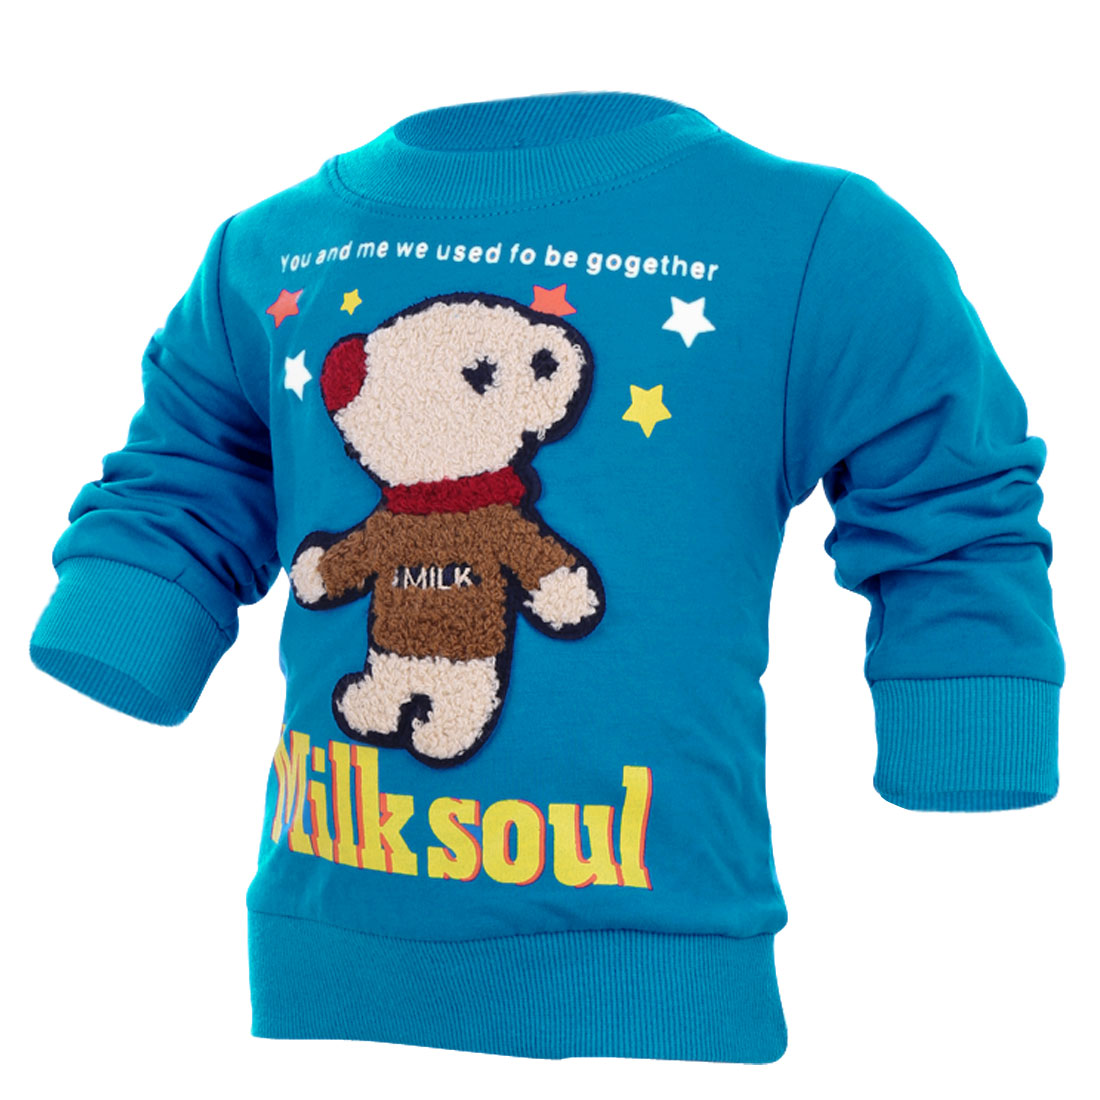 Boys Girls Round Neck Long Sleeve Blue Spring Casual Sweatshirt 2T